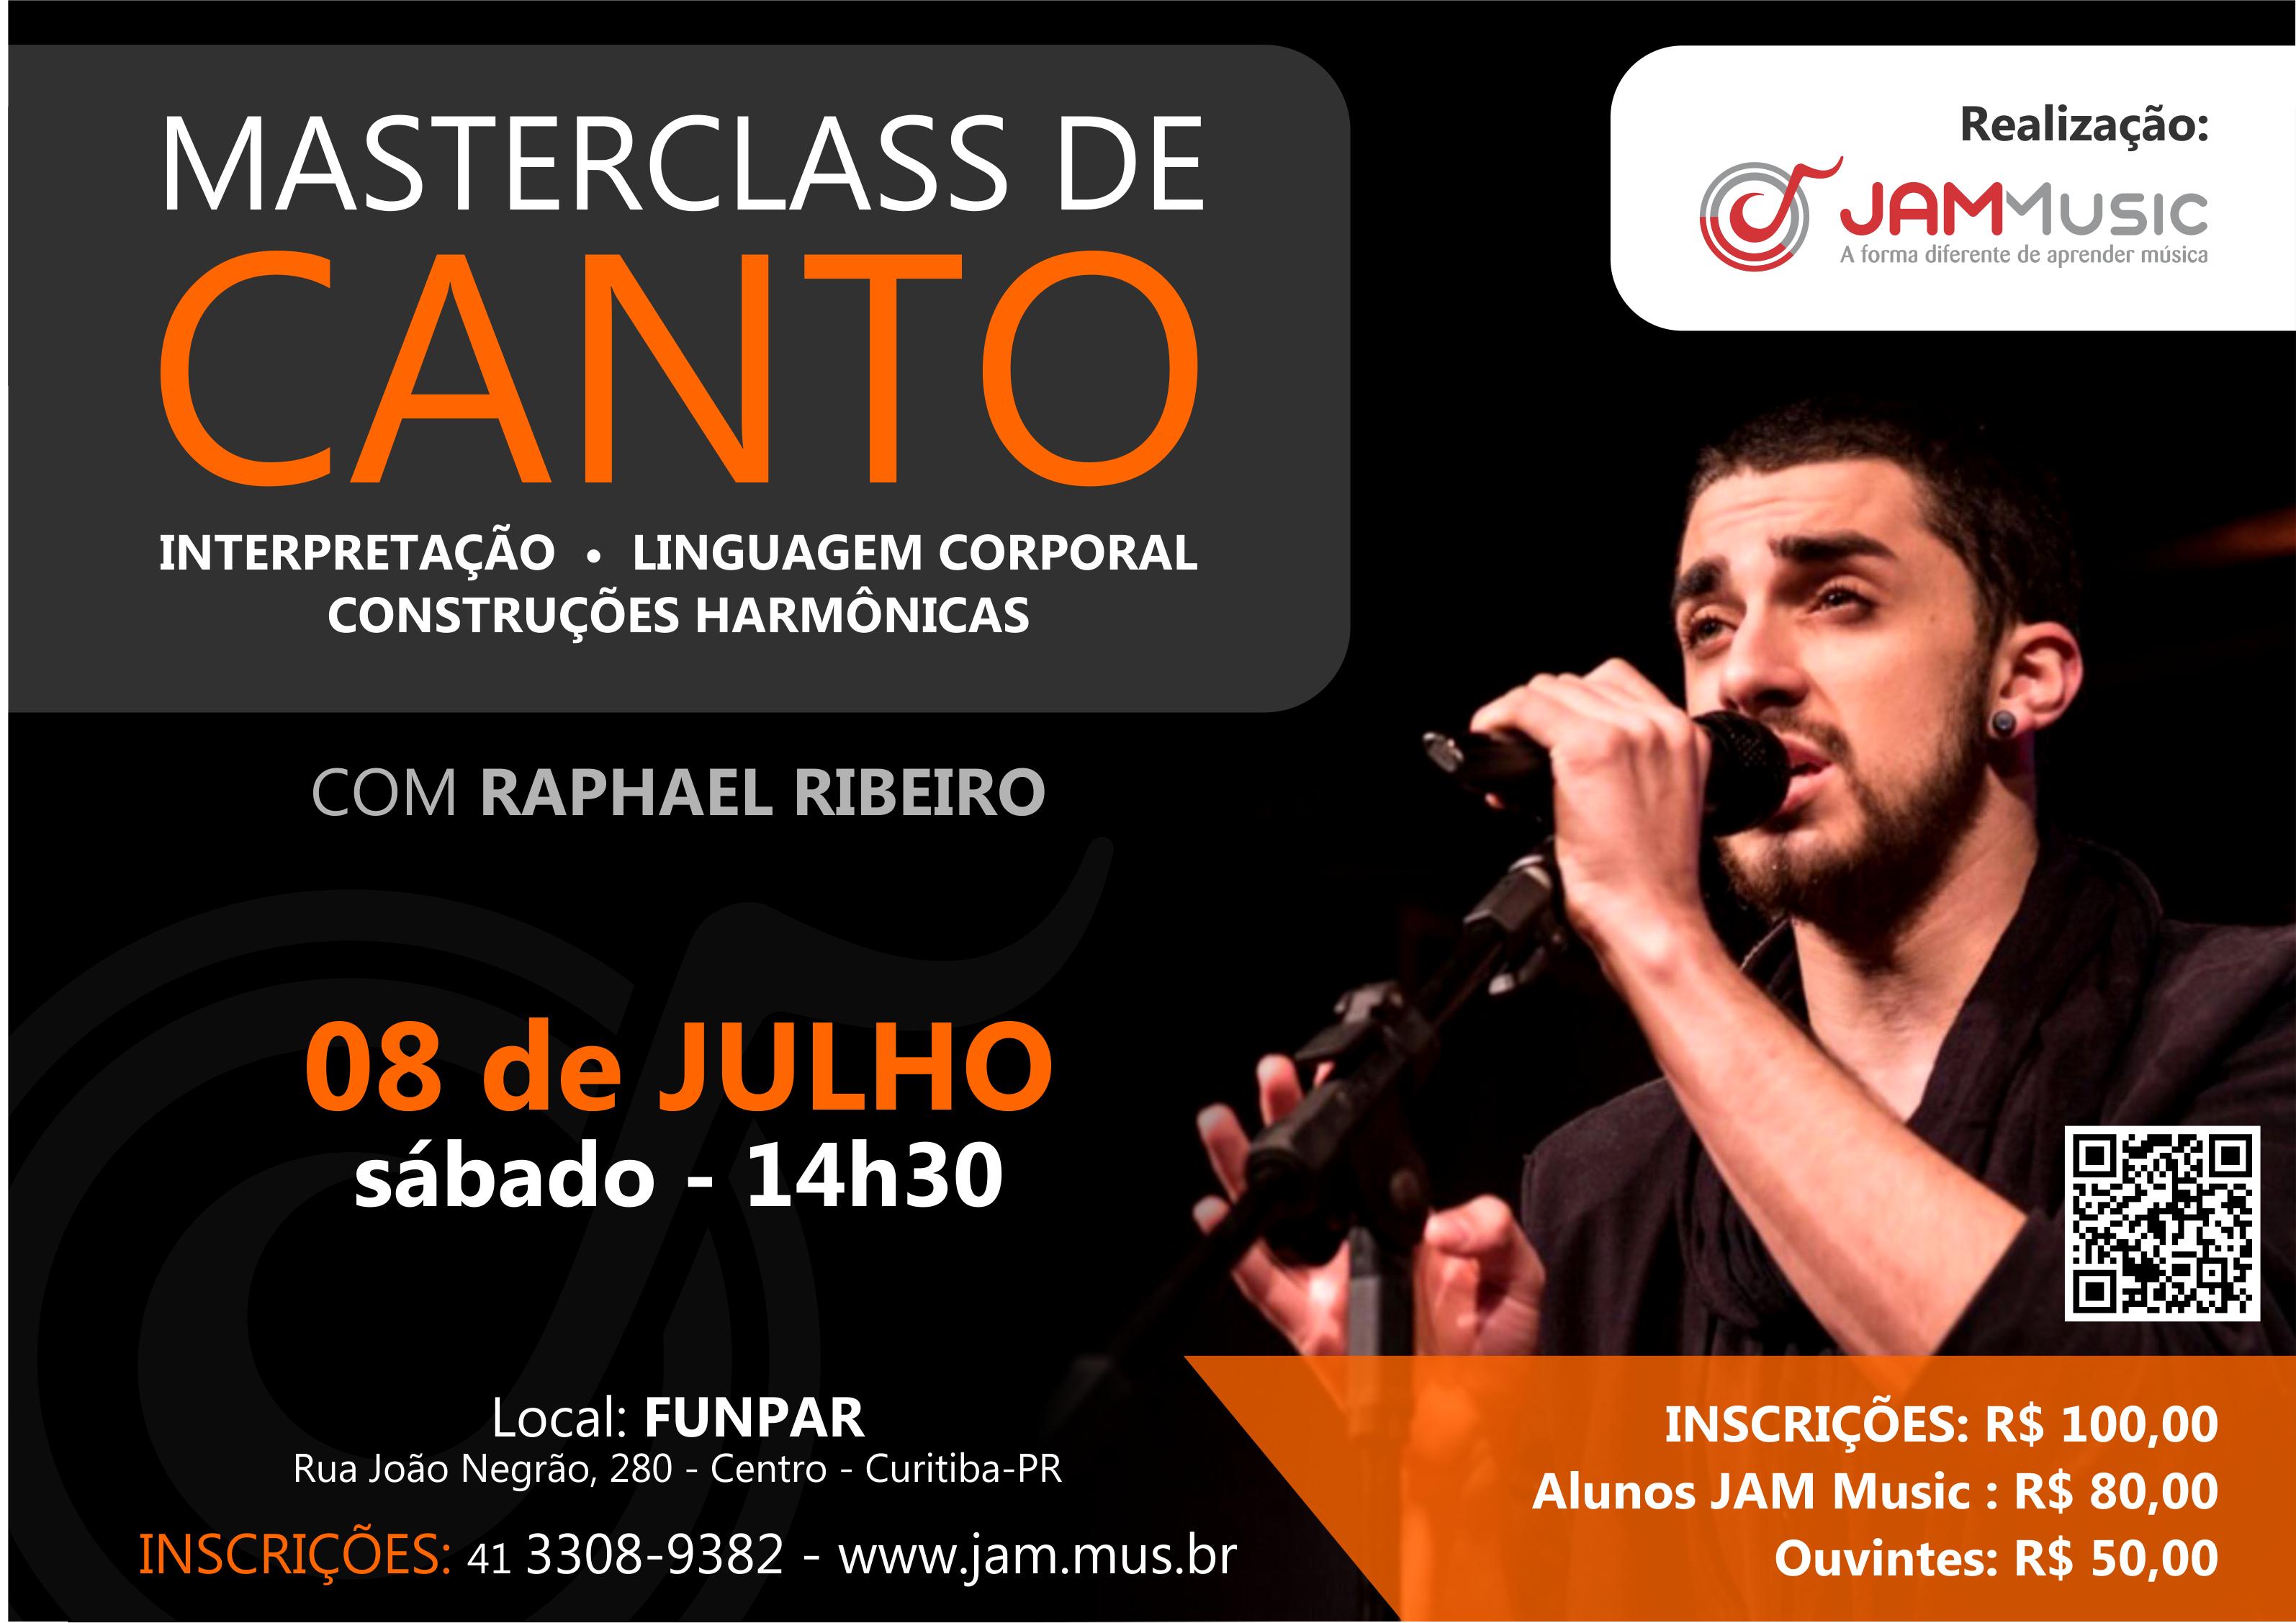 Masterclass Canto - Raphael Ribeiro - JAM Music